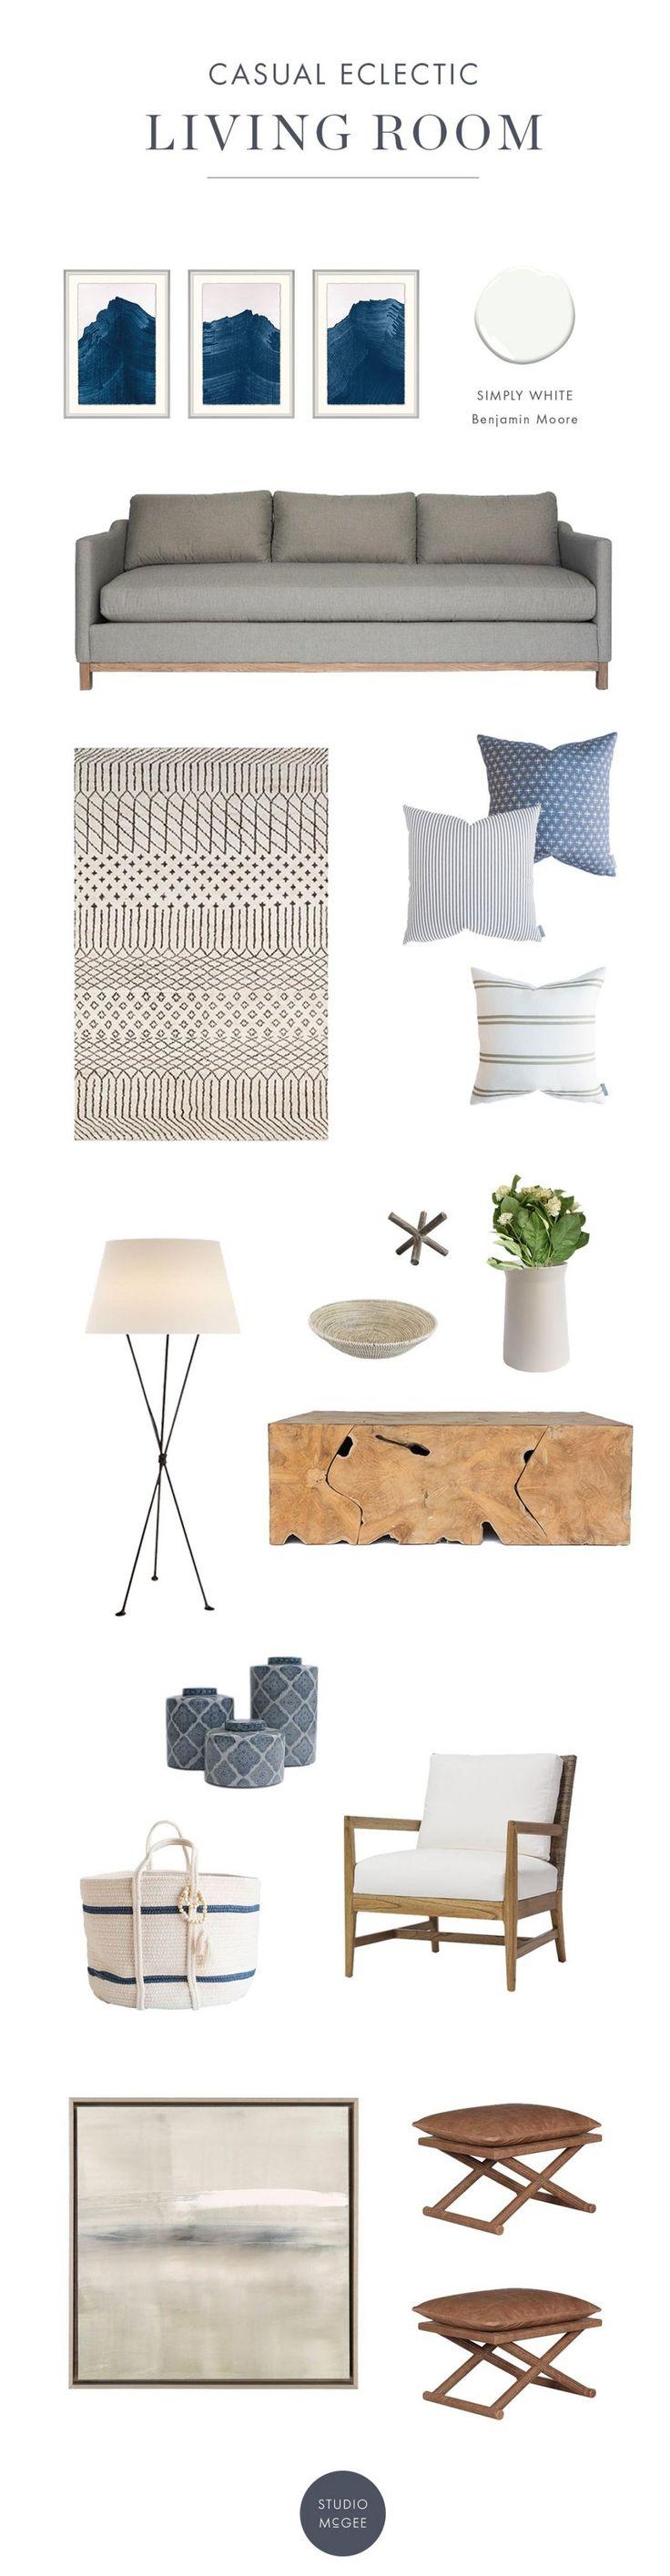 13 best Furniture images on Pinterest